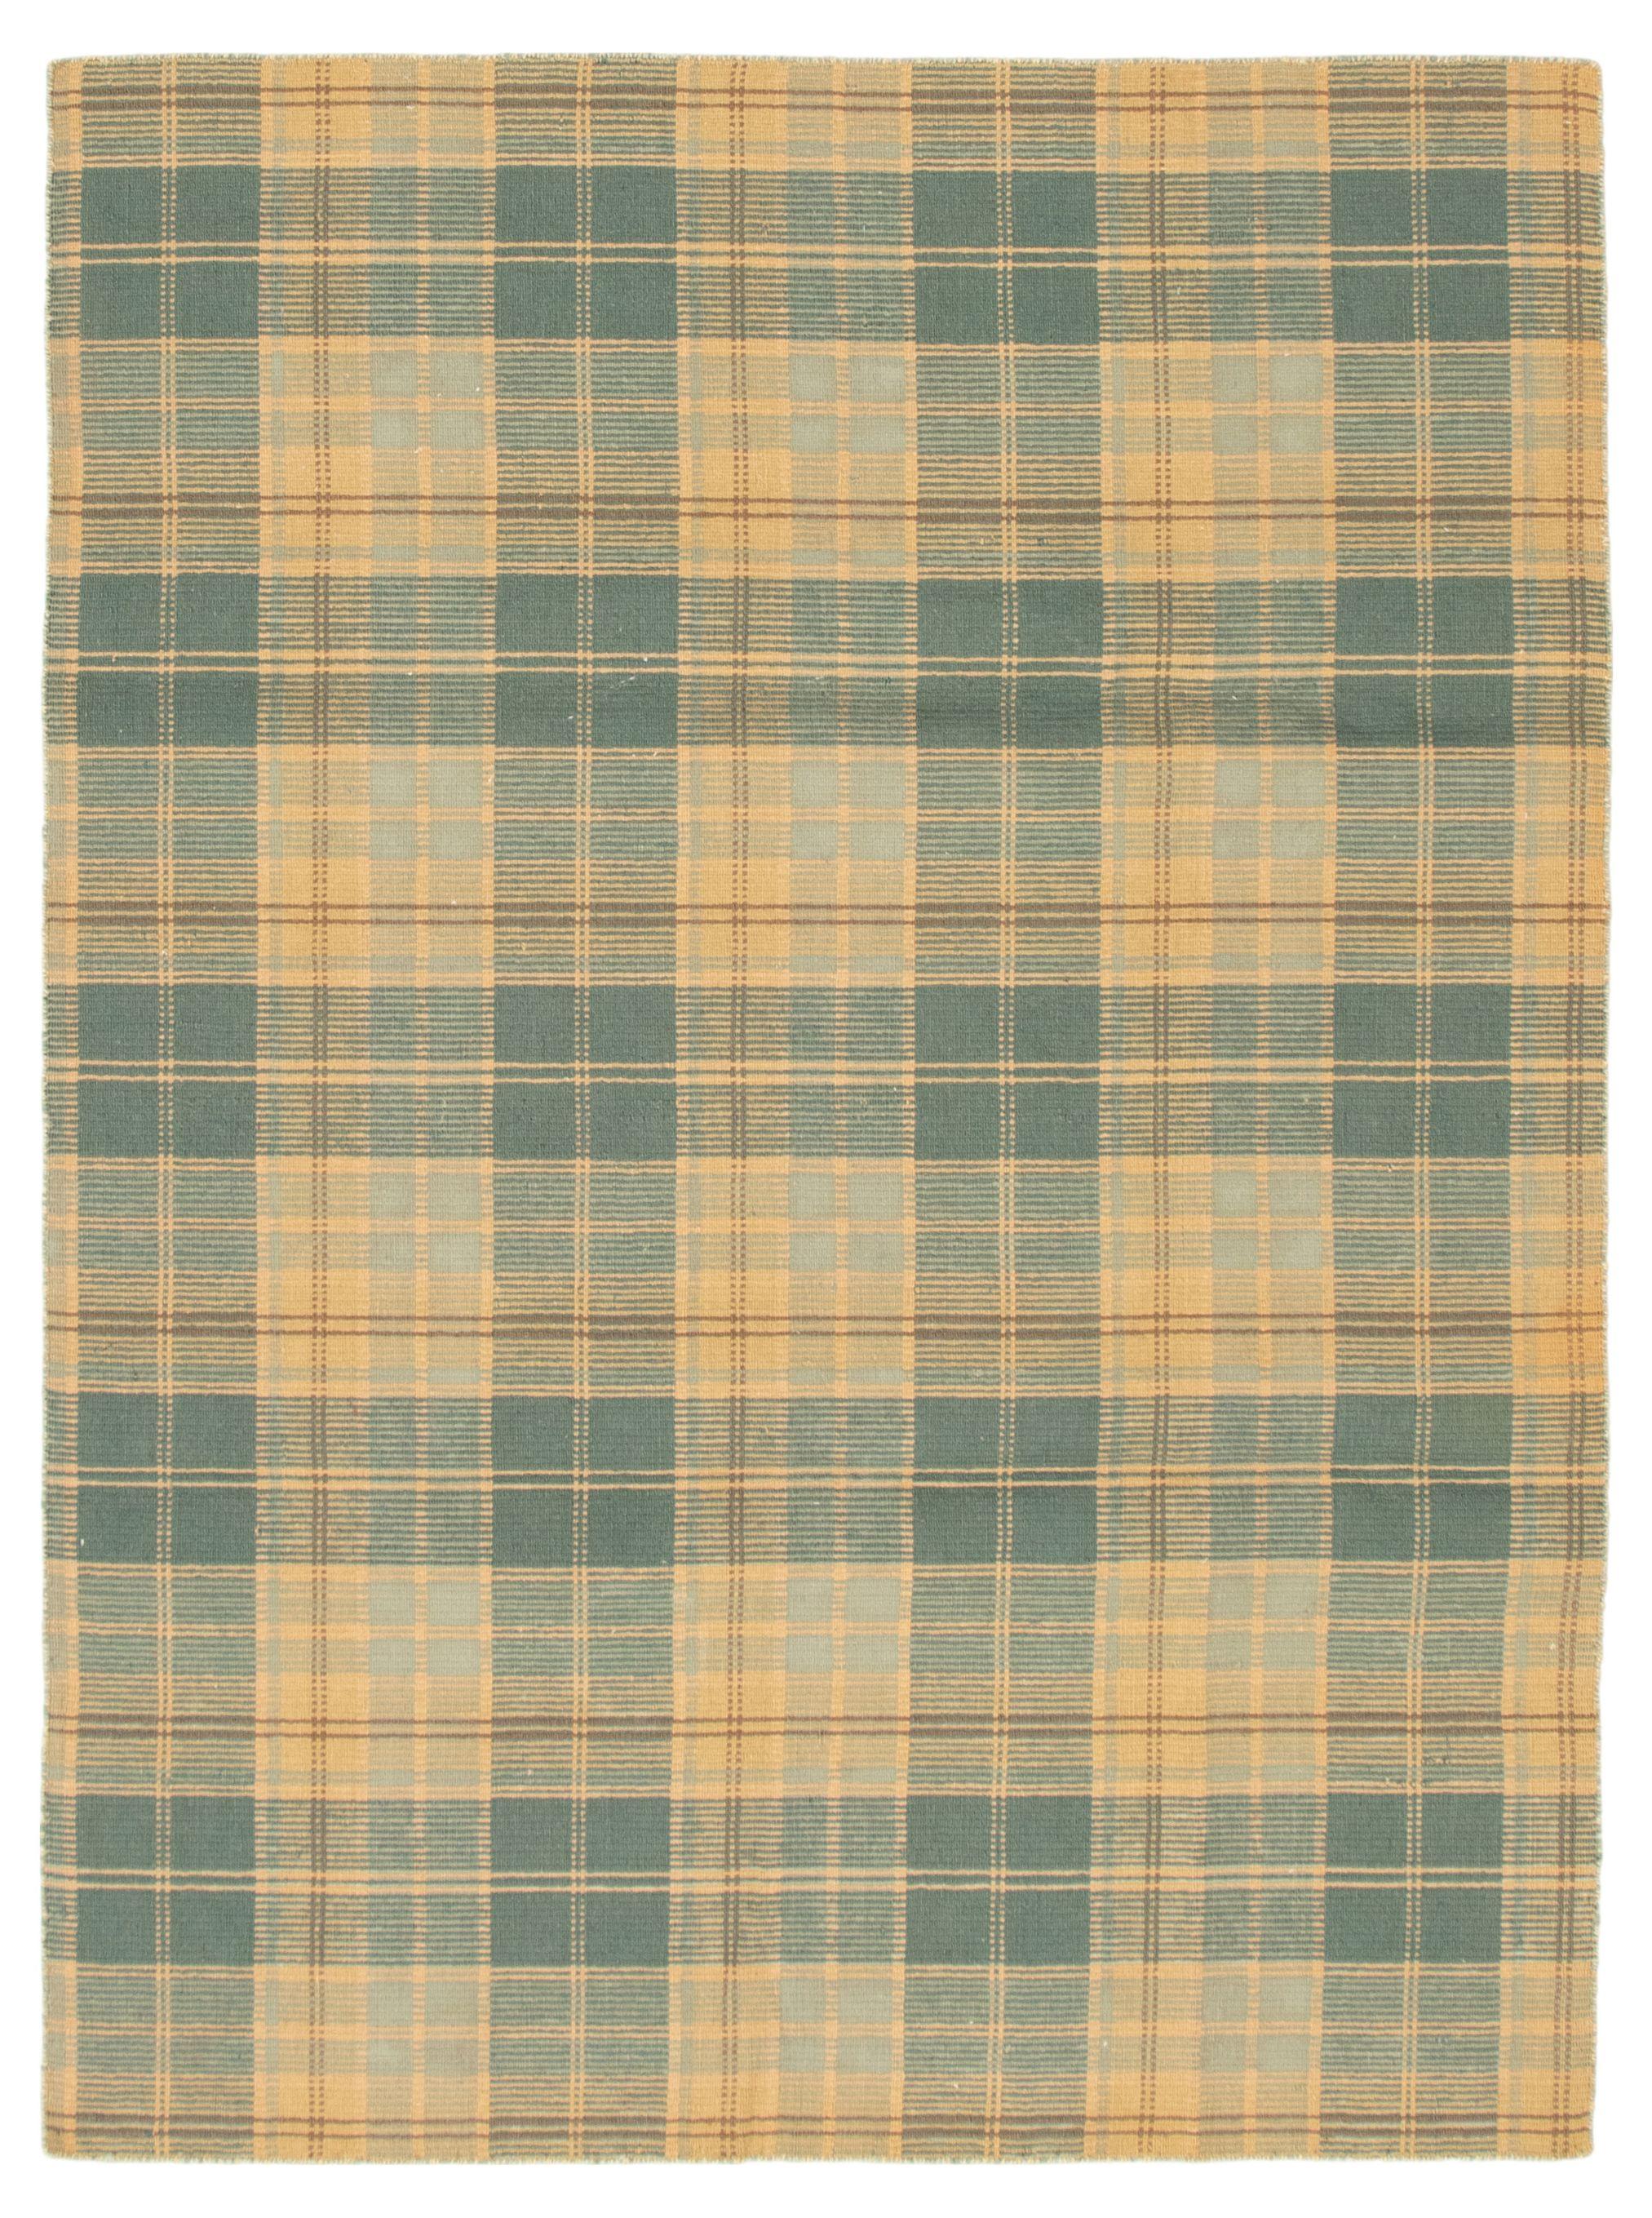 "Hand woven Manhattan Beige, Teal Wool Kilim 5'7"" x 7'11"" Size: 5'7"" x 7'11"""